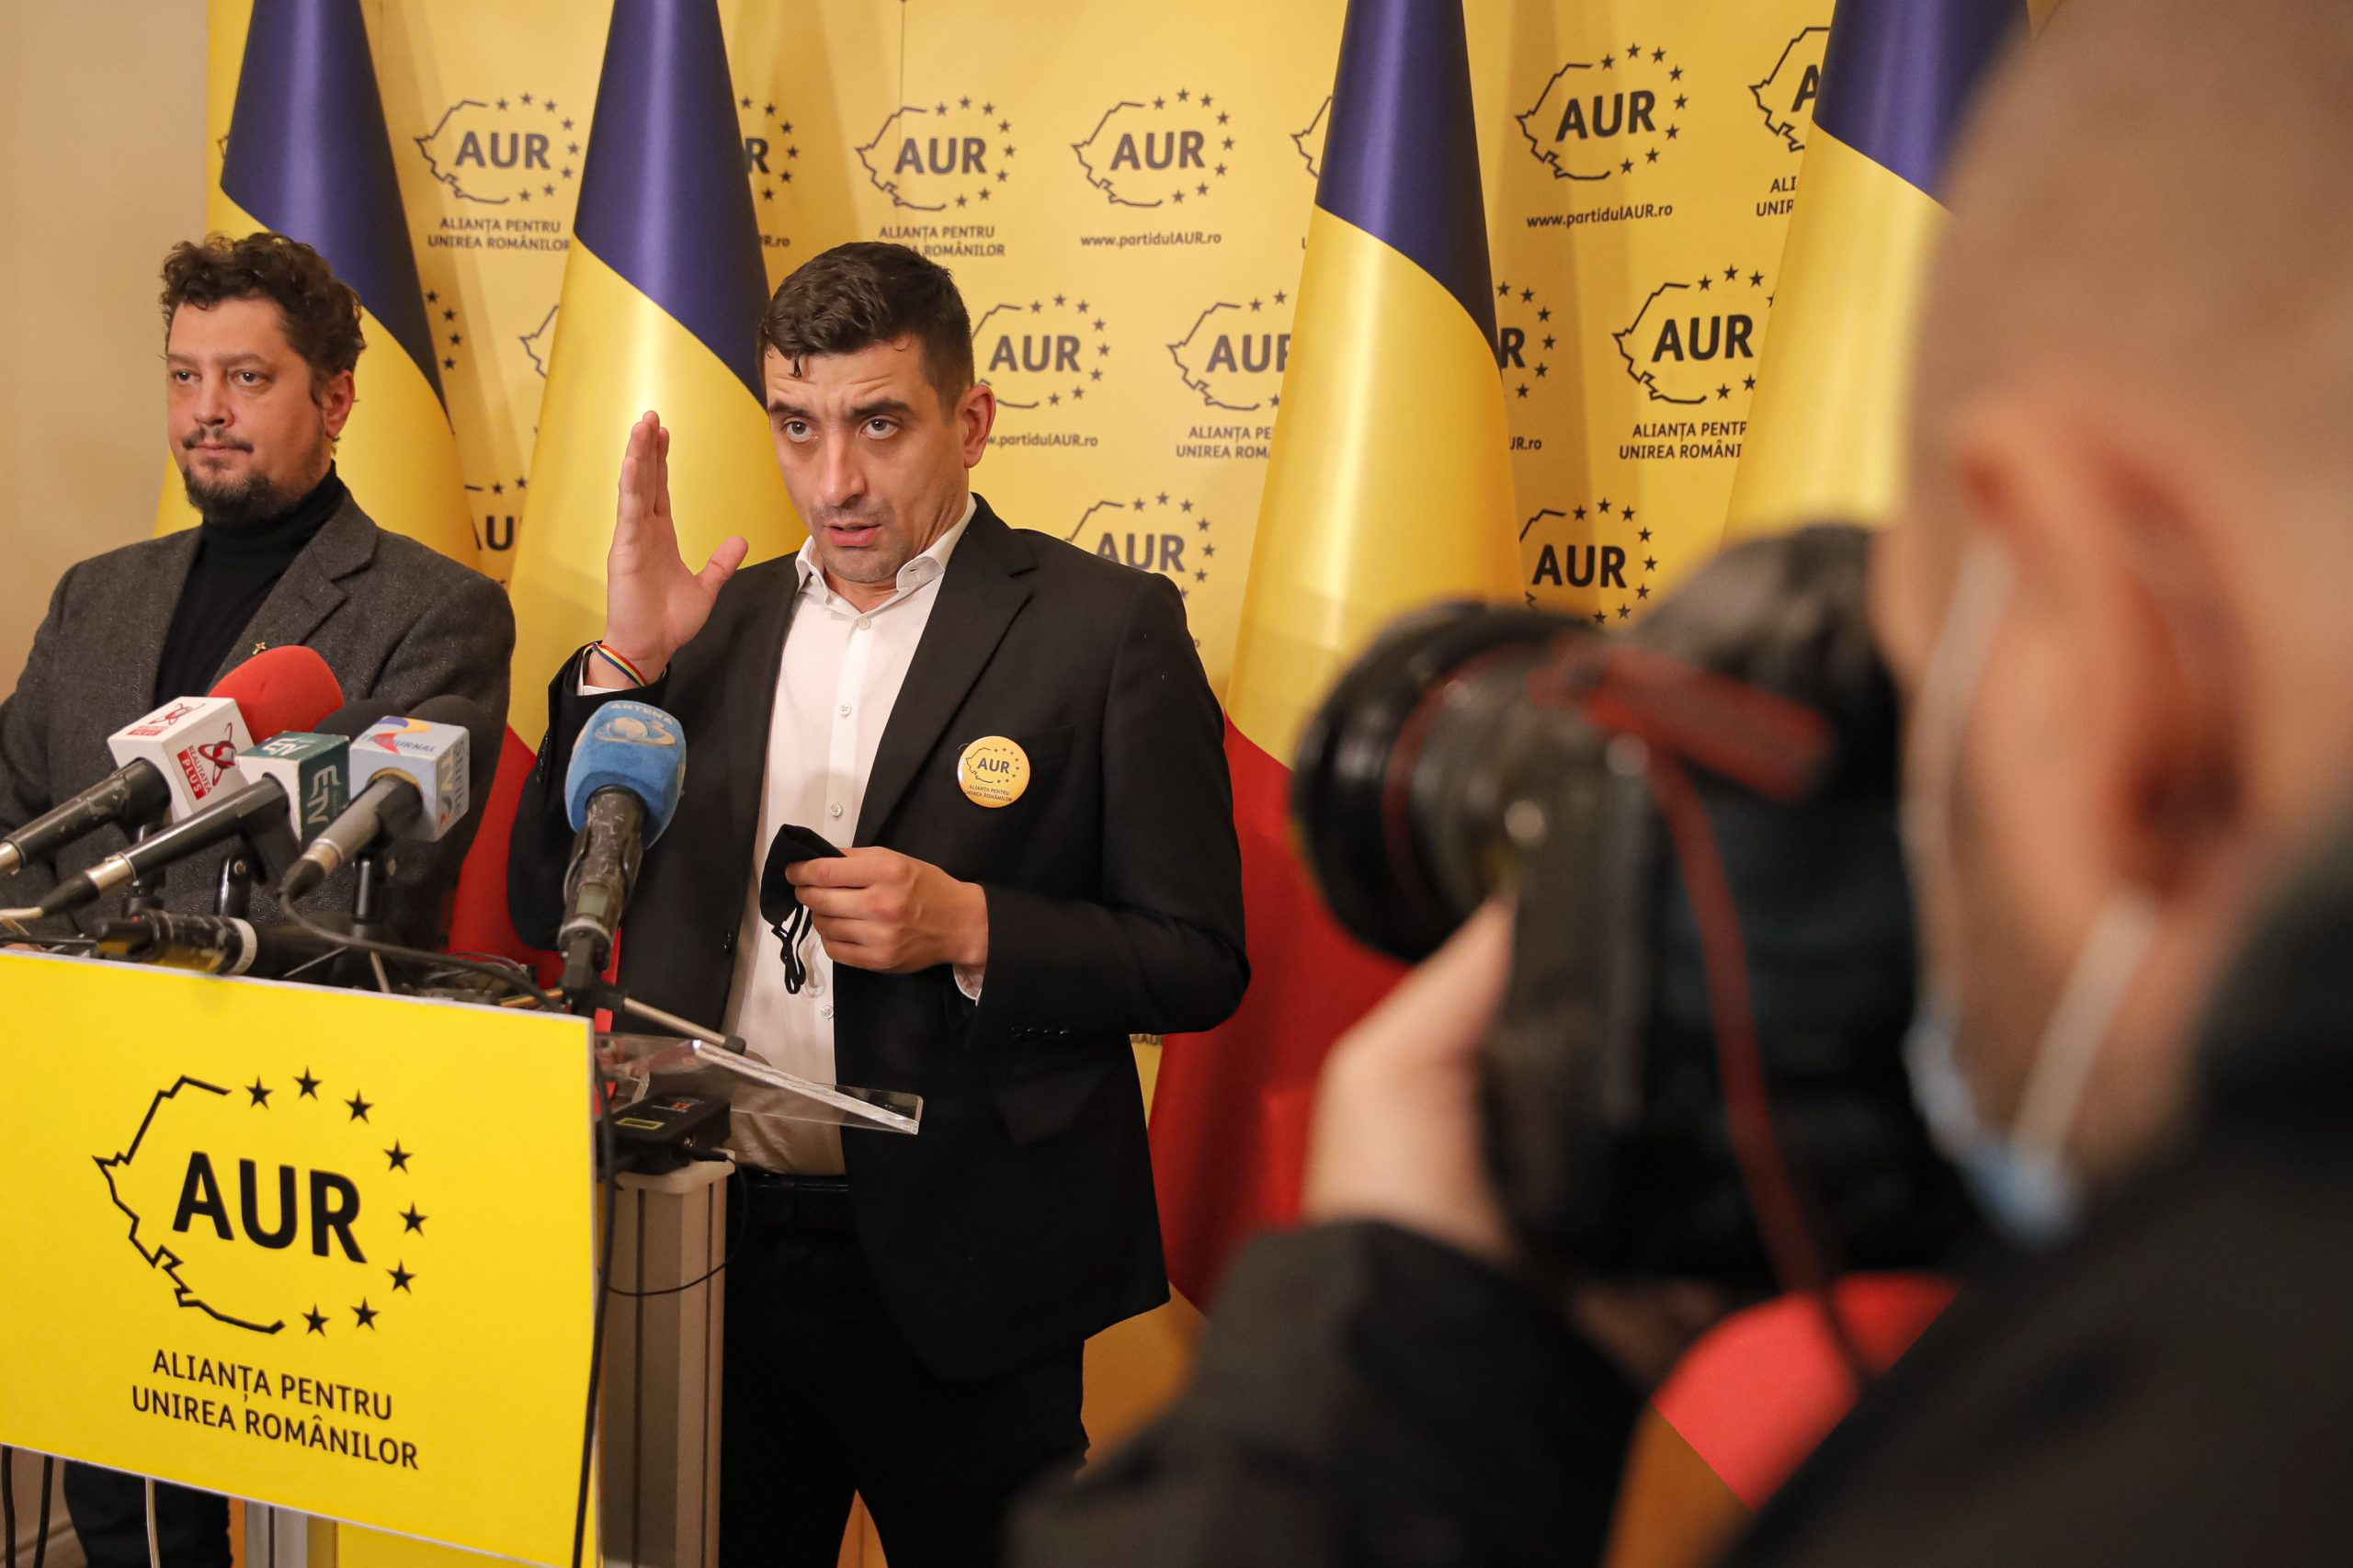 Hungarophobia Rears its 'Golden' Head in Romania